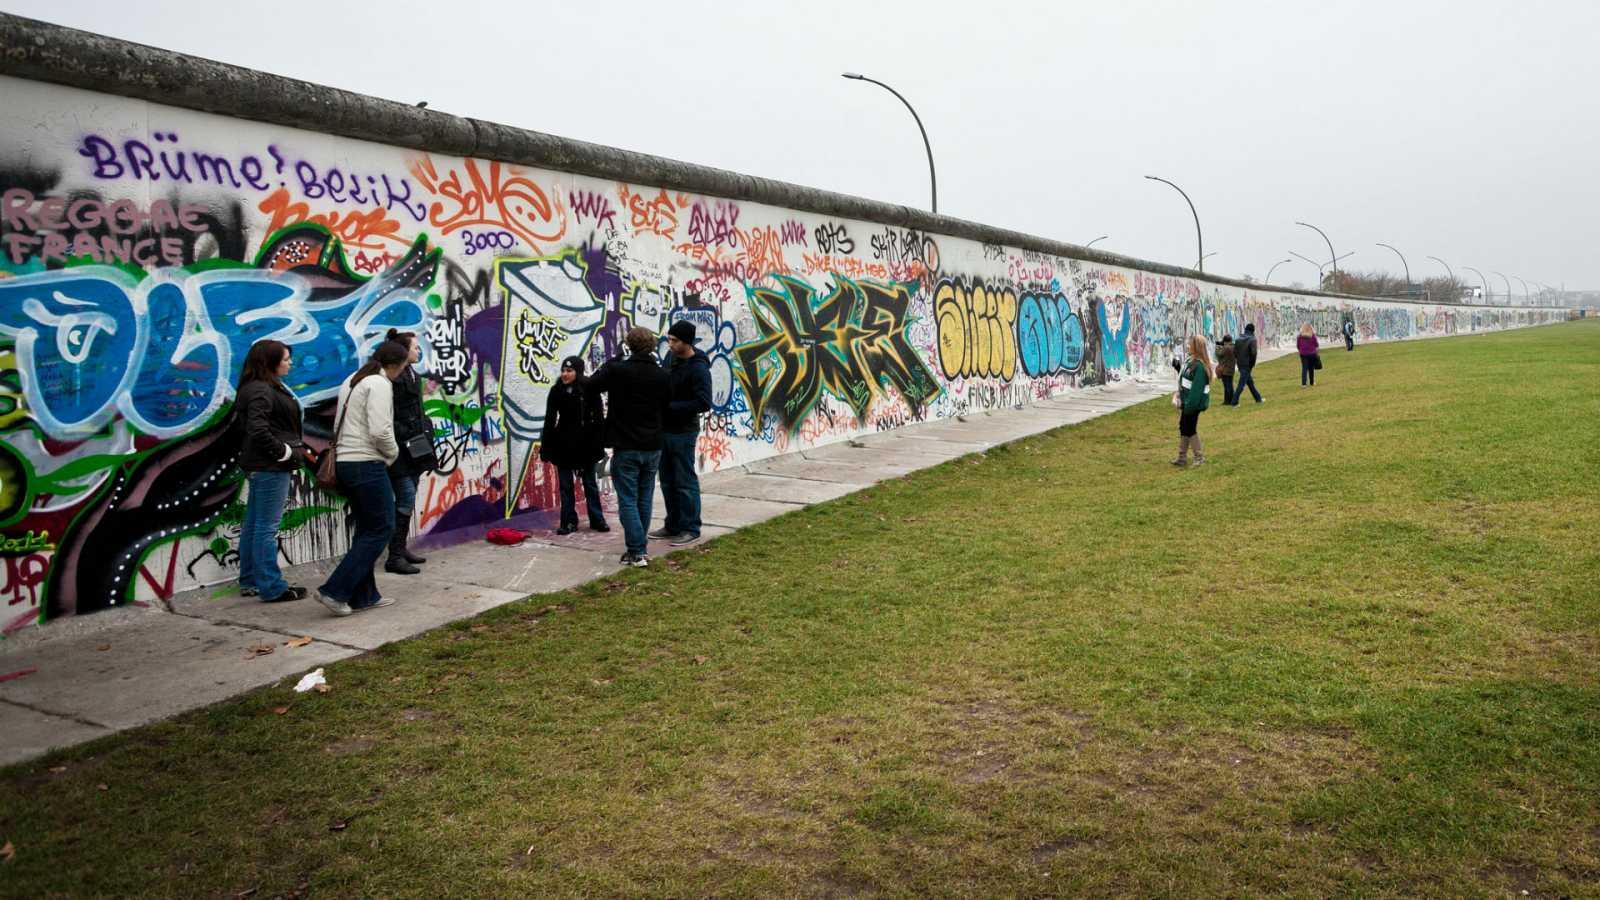 Canal Europa - Agenda cultural: Berlín, 30 años sin muro - 05/11/19 - Escuchar ahora